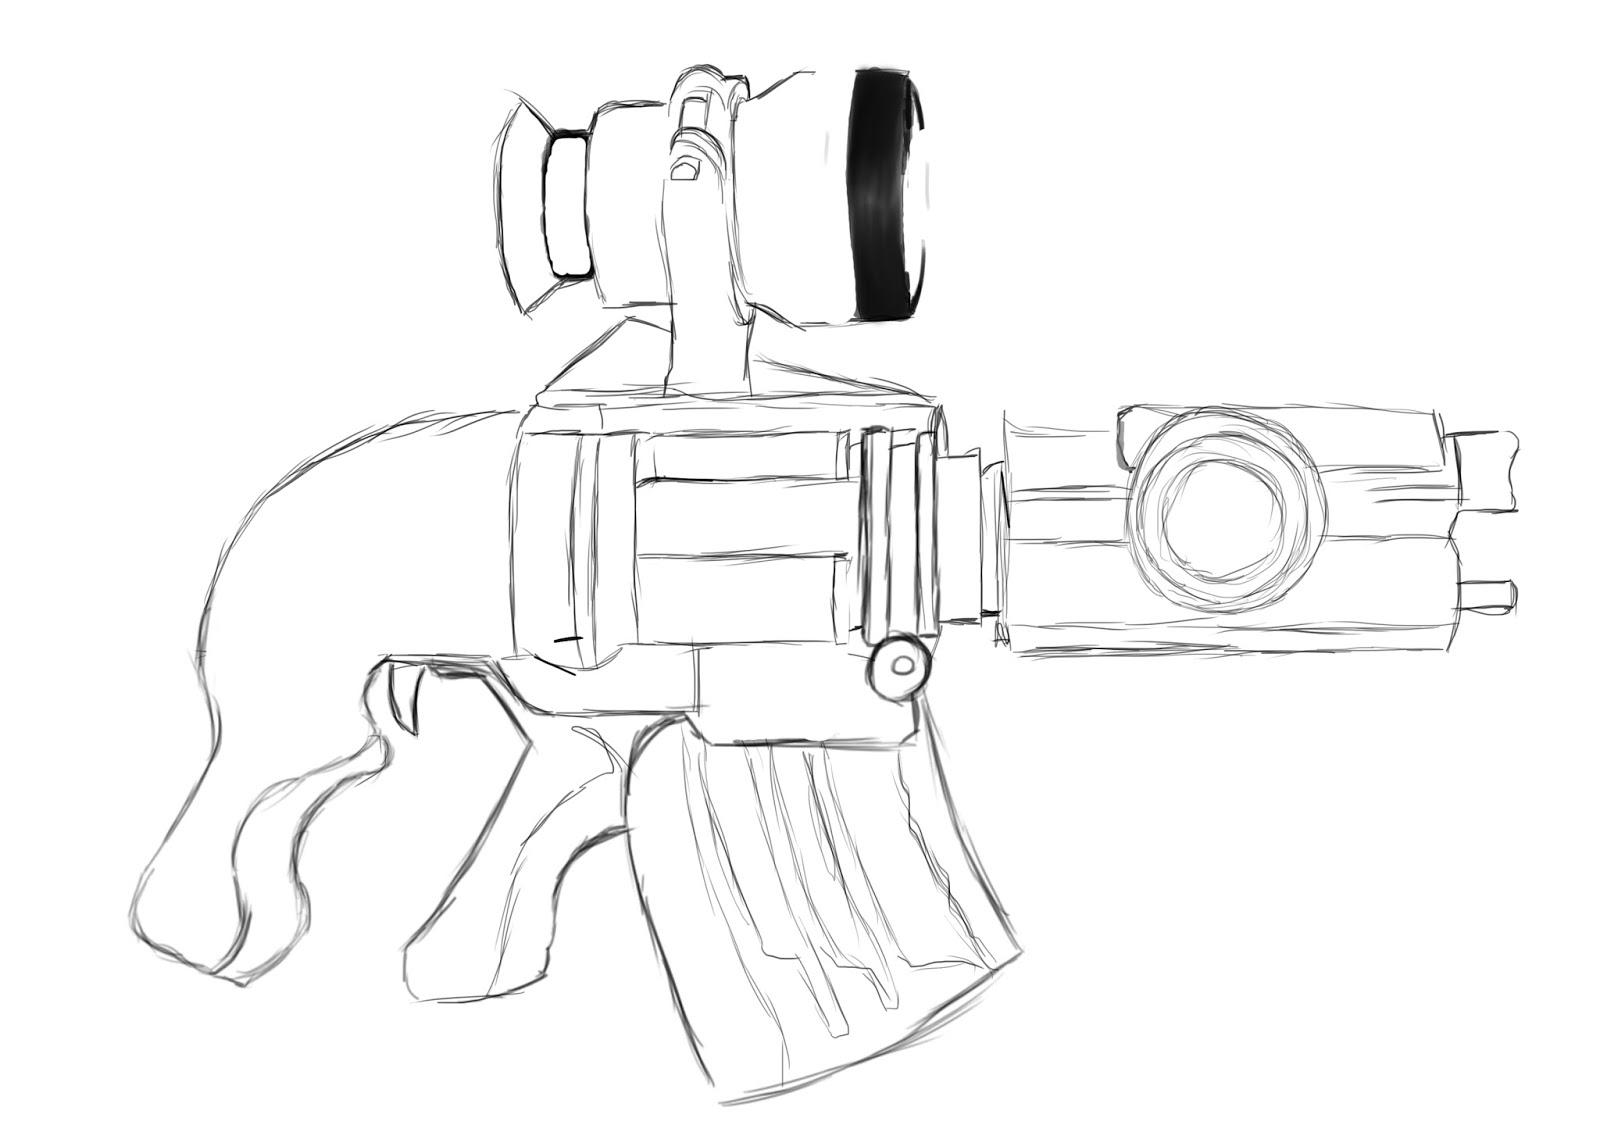 1600x1143 The Small Things My Futuristic Gun